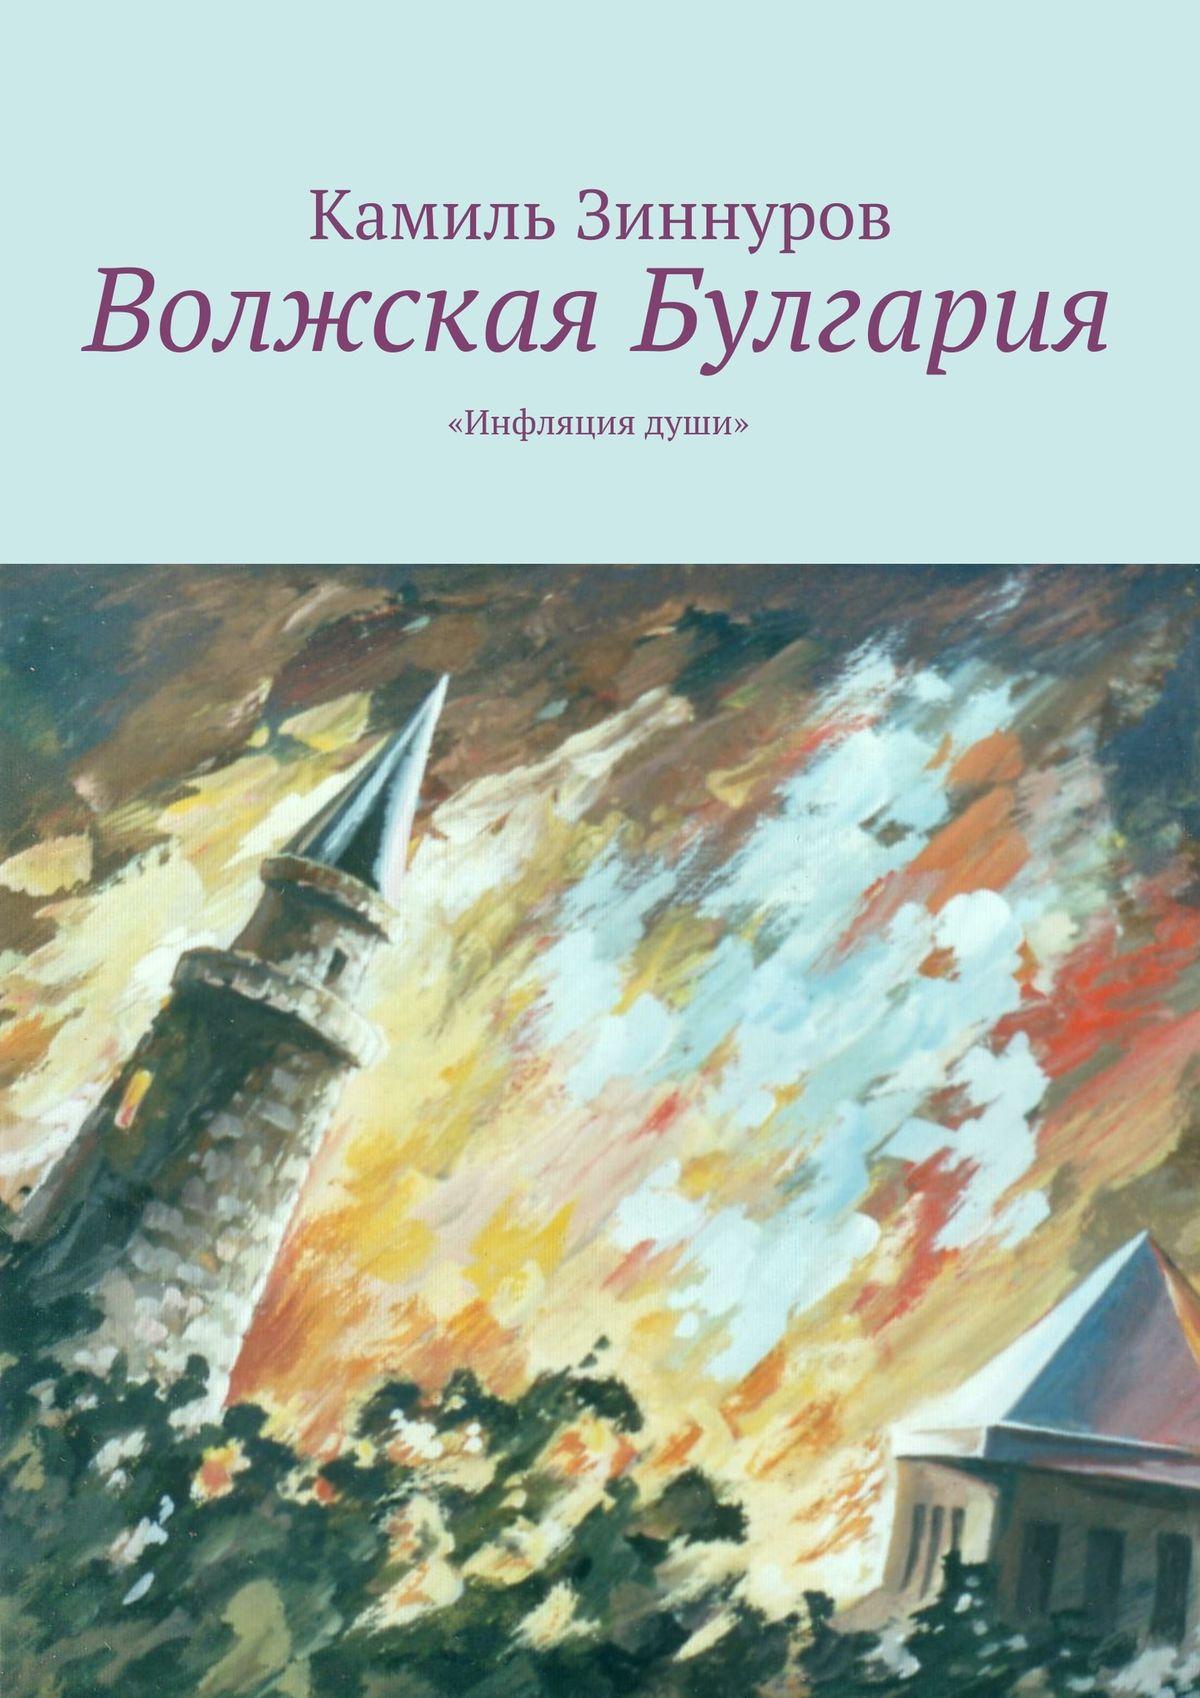 Камиль Богданурович Зиннуров Волжская Булгария